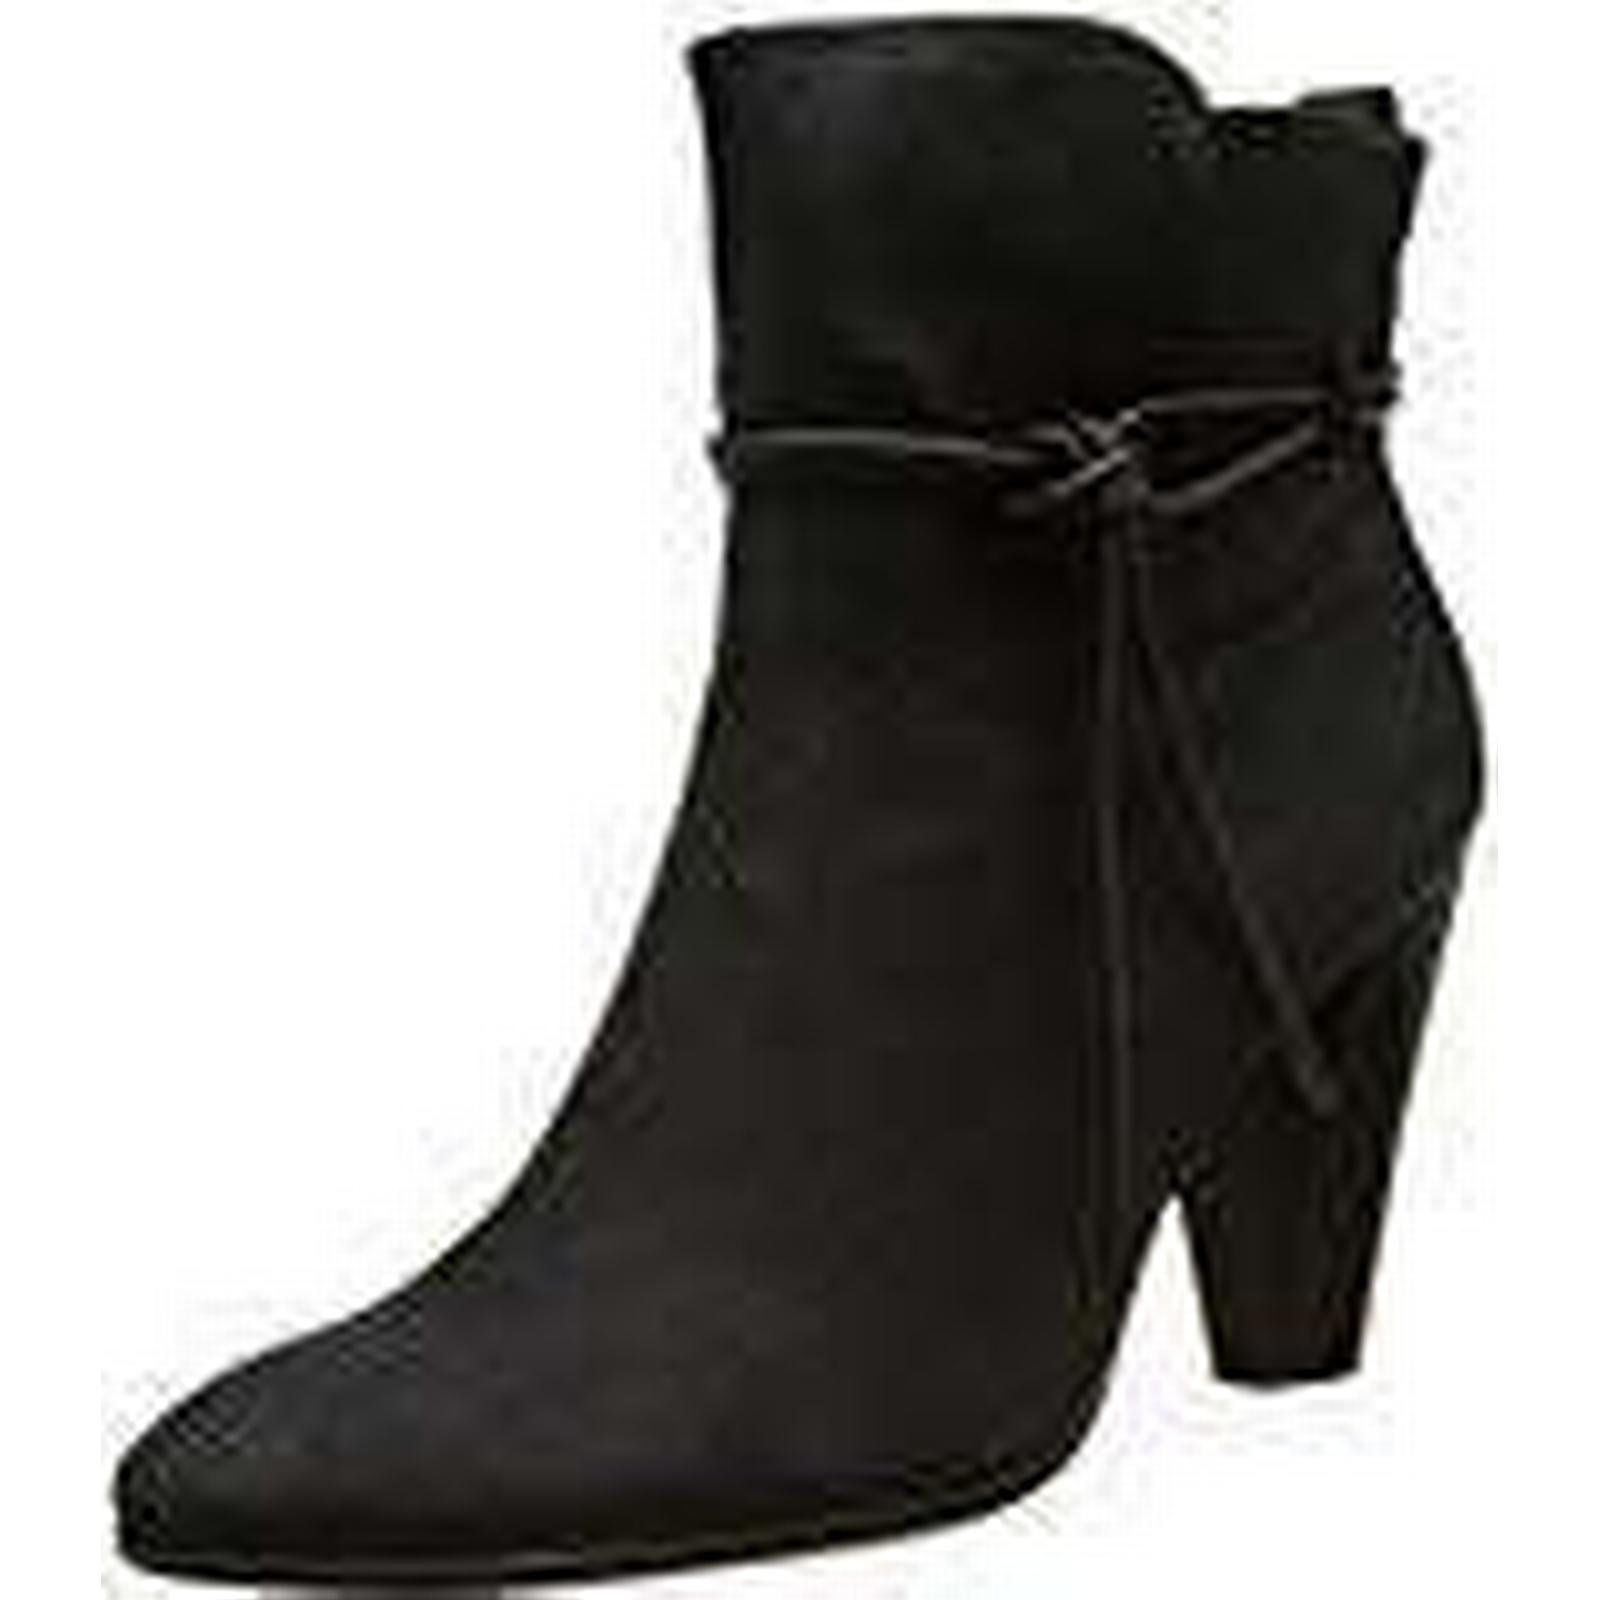 ECCO Women's Black Shape 75 Ankle Boots, Black Women's (51052black/Black), 7.5 UK 943ddf